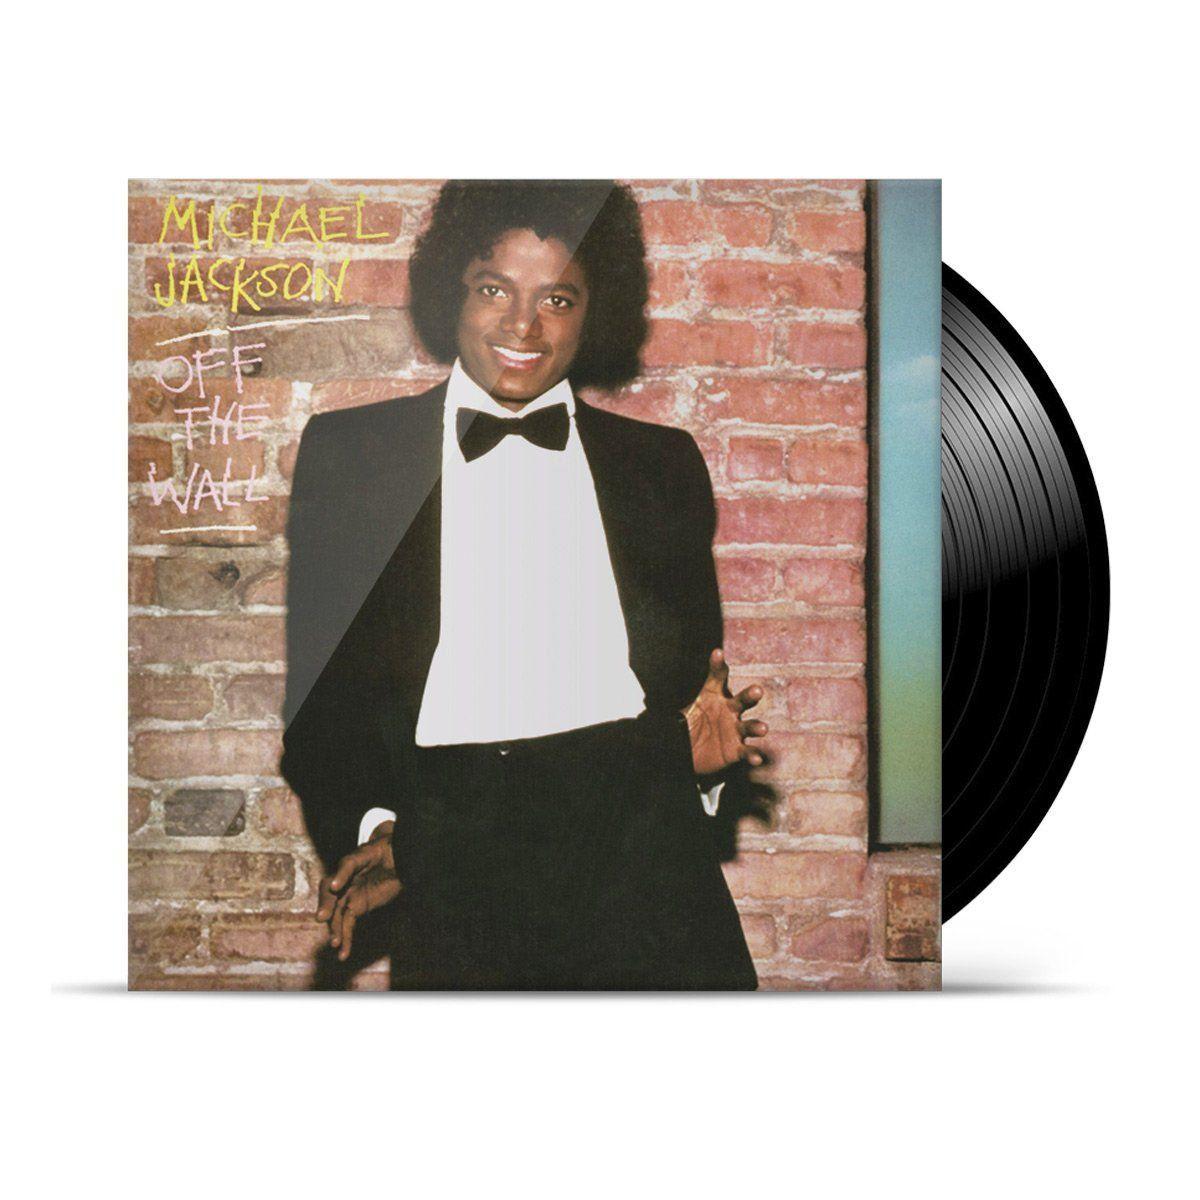 LP Michael Jackson Off The Wall  - bandUP Store Marketplace